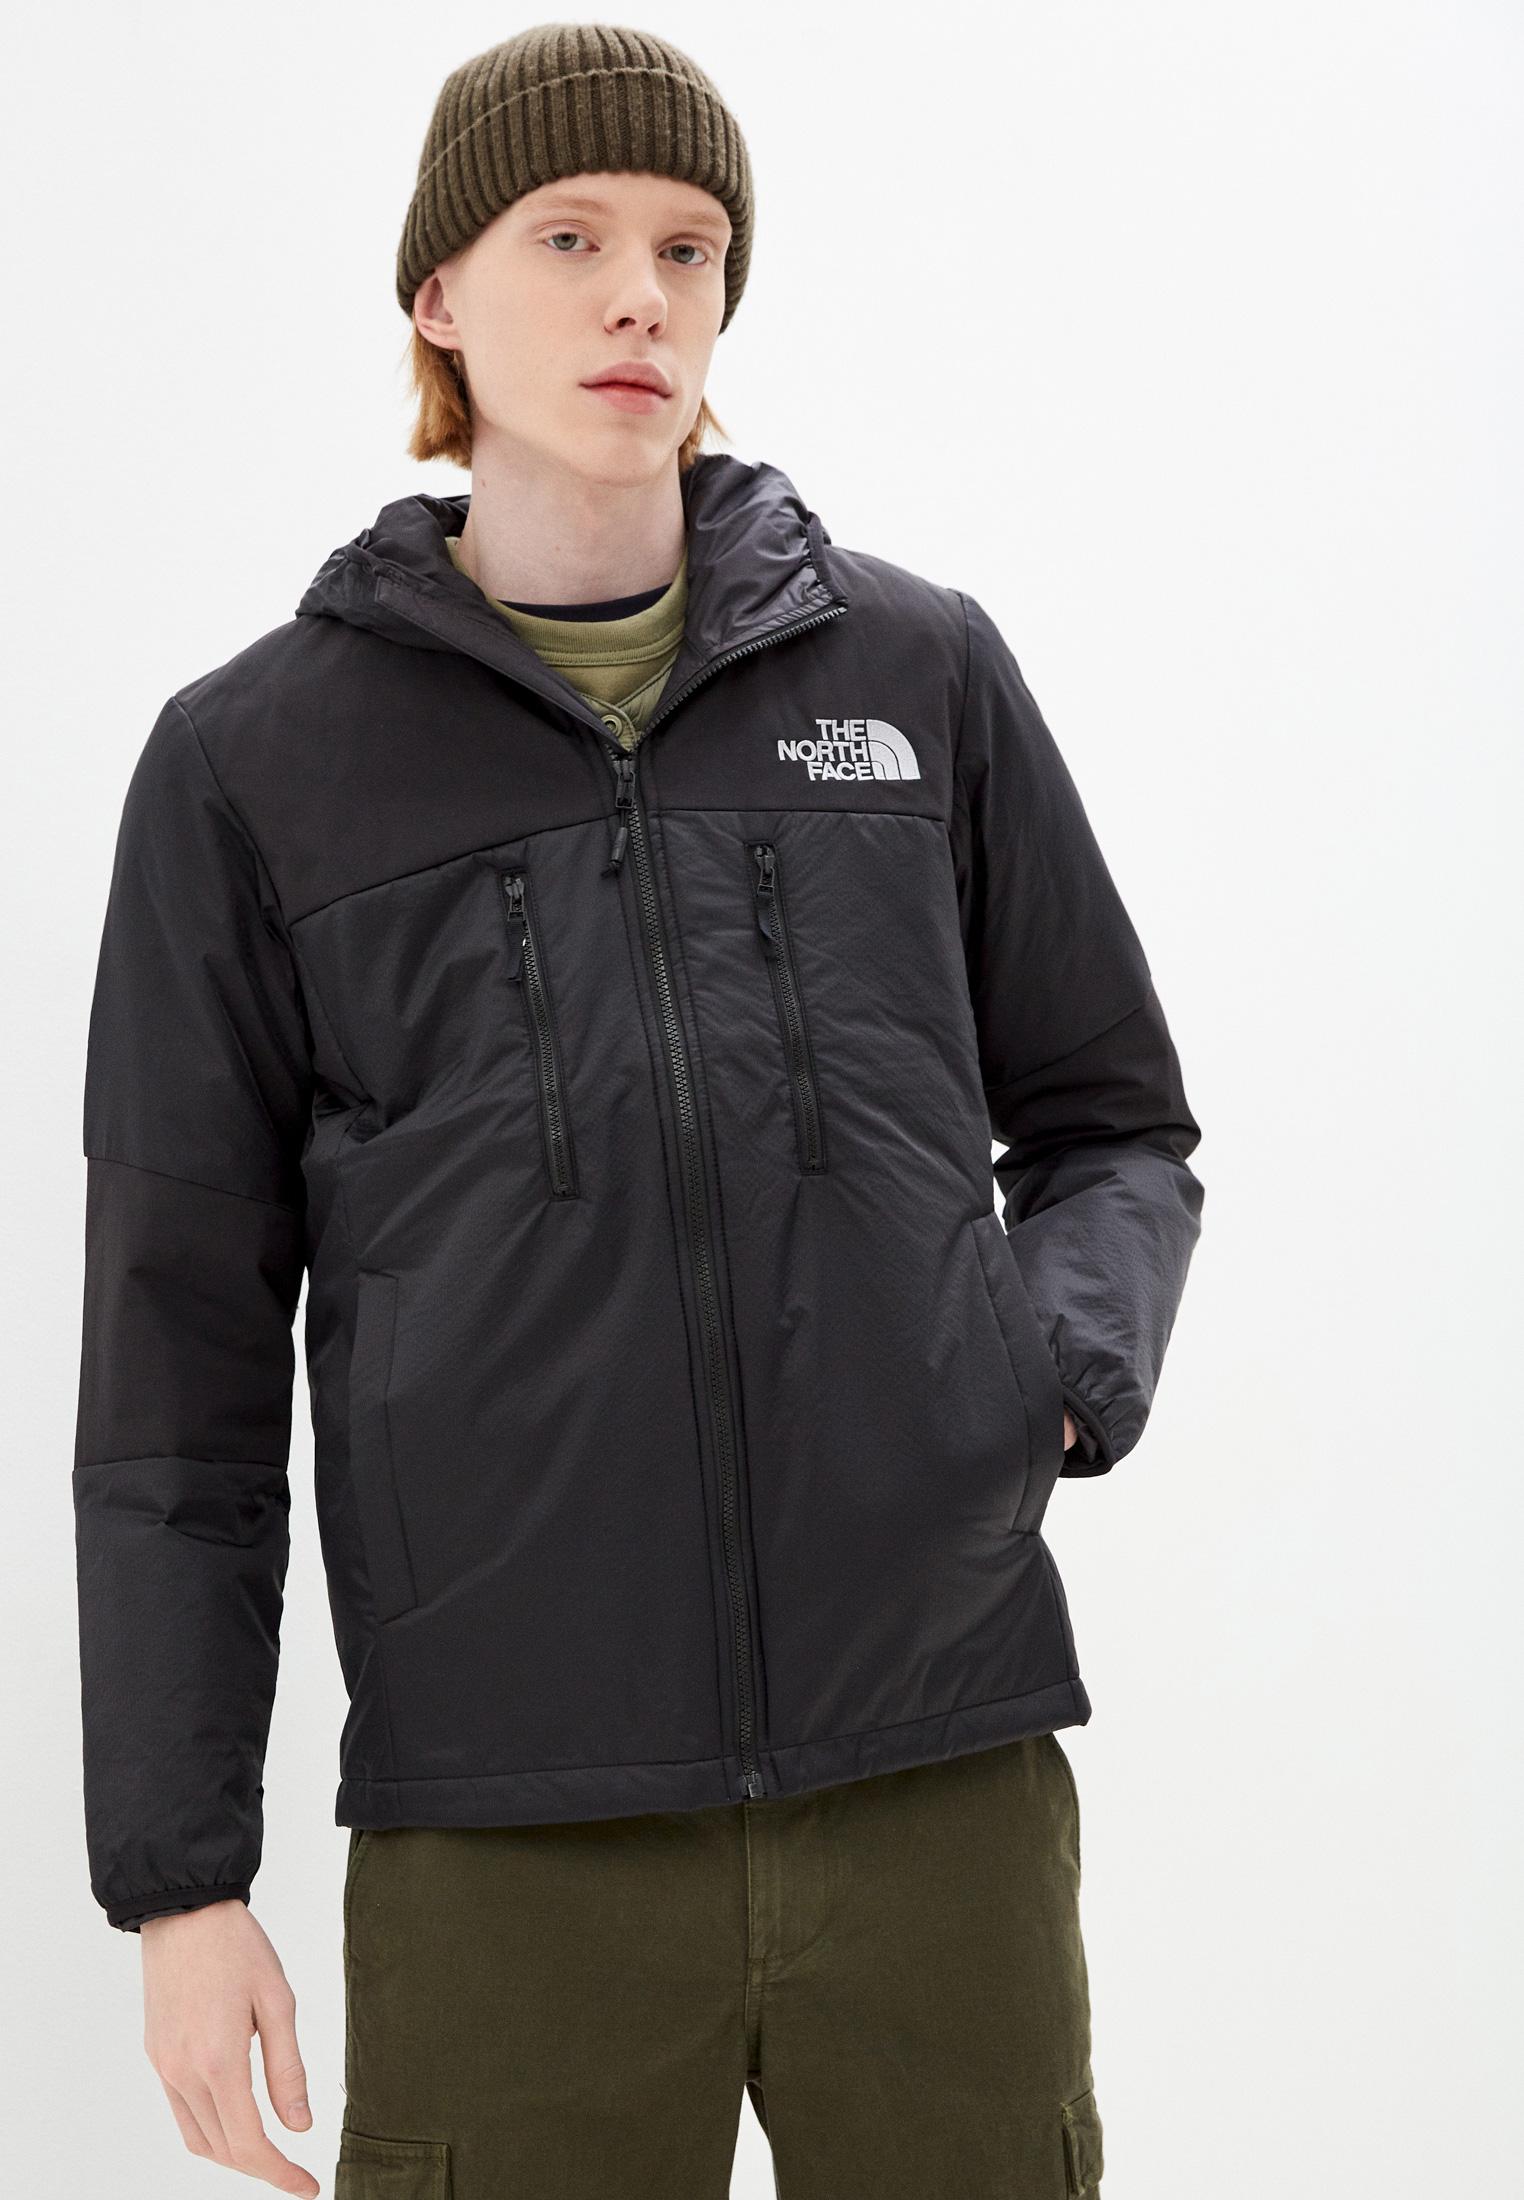 Мужская верхняя одежда The North Face (Зе Норт Фейс) T93L2G